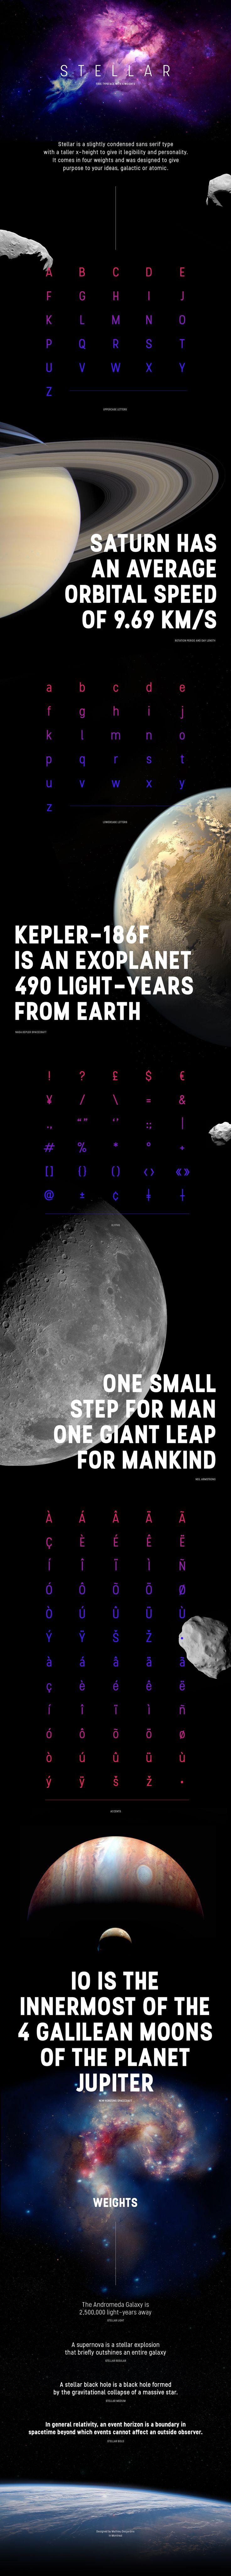 https://www.behance.net/gallery/27499203/Stellar-Free-Font?utm_source=PixelBuddha Newsletter